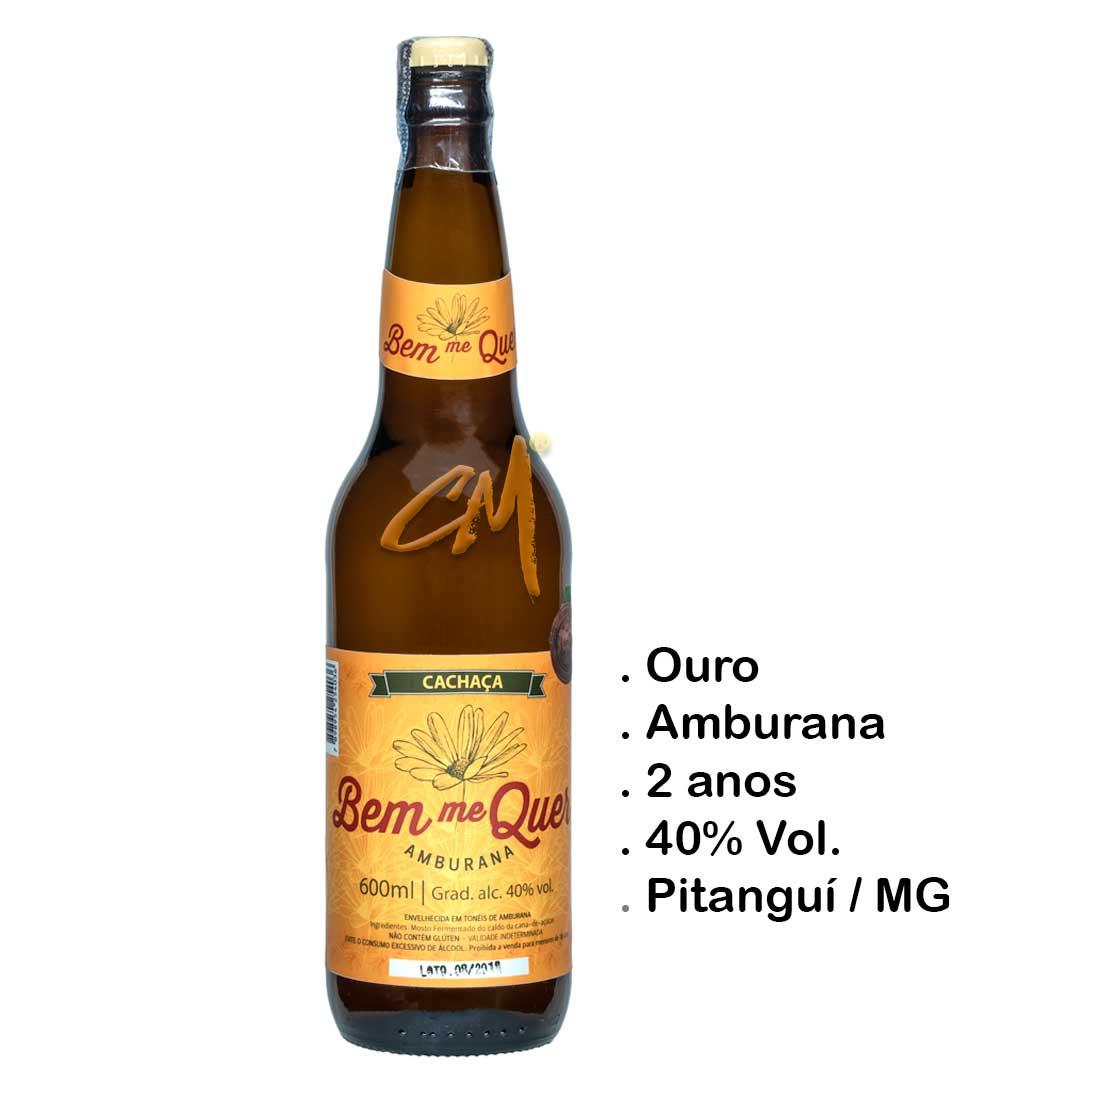 Cachaça Bem Me Quer Amburana 600 ml (Pitanguí - MG)